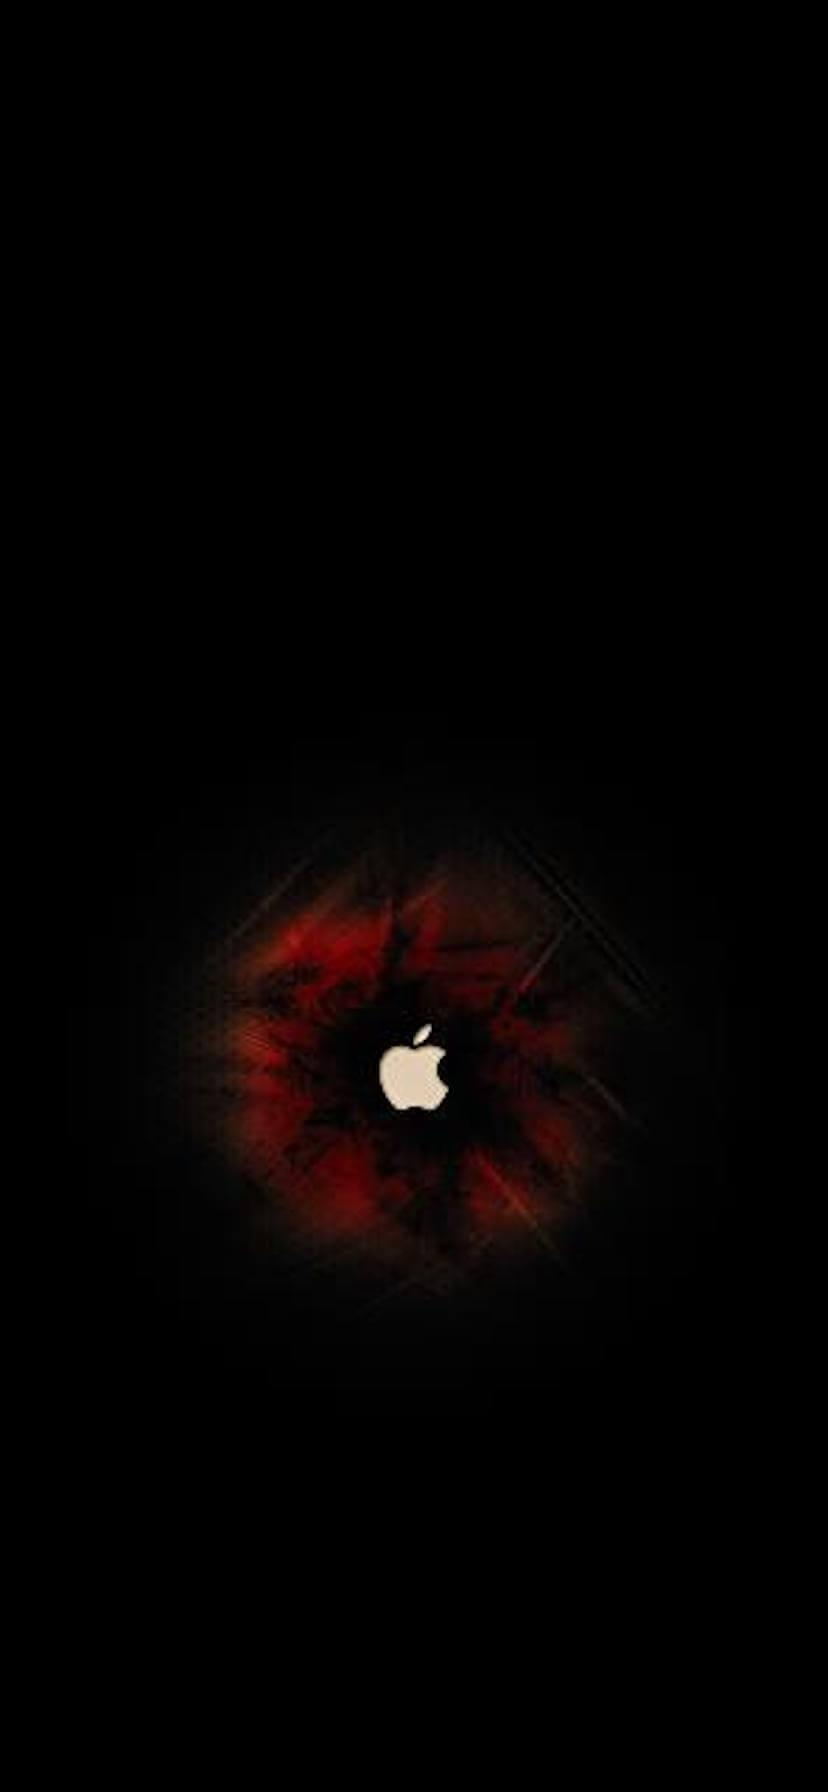 Download Wallpaper Iphone Xs Max Black Hd Cikimmcom